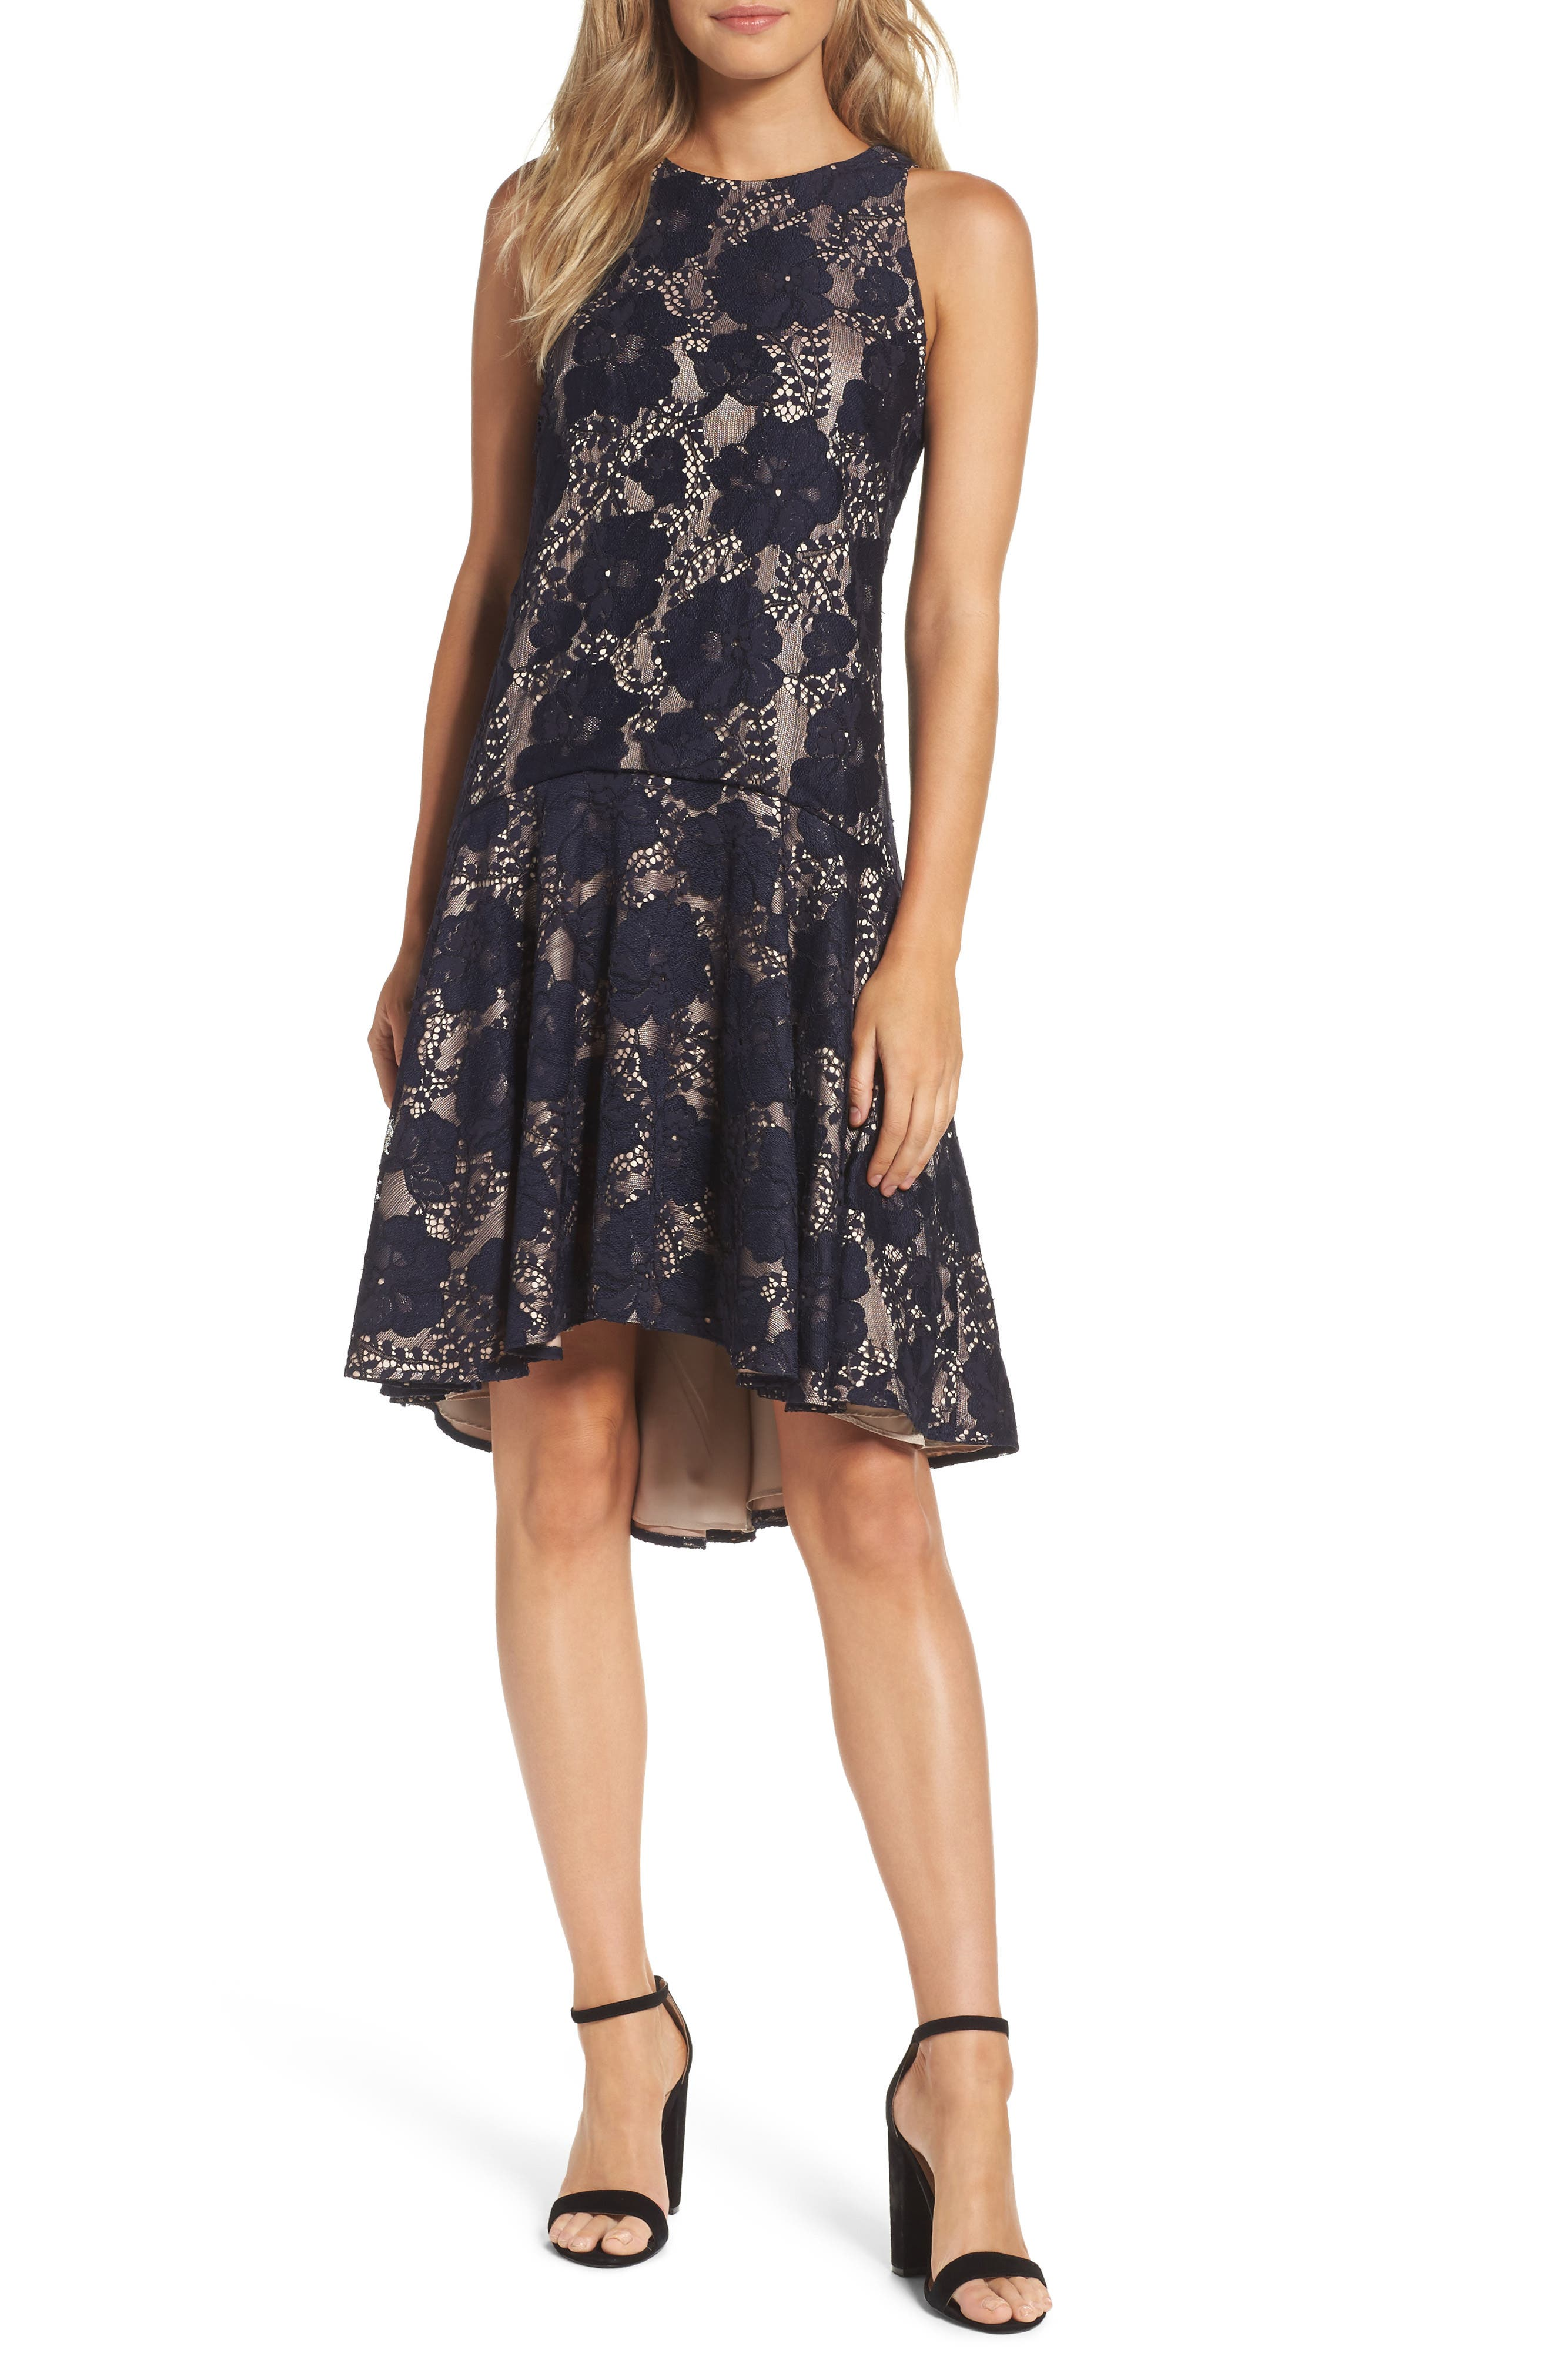 Alternate Image 1 Selected - Eliza J Sleeveless Lace Drop Waist High/Low Dress